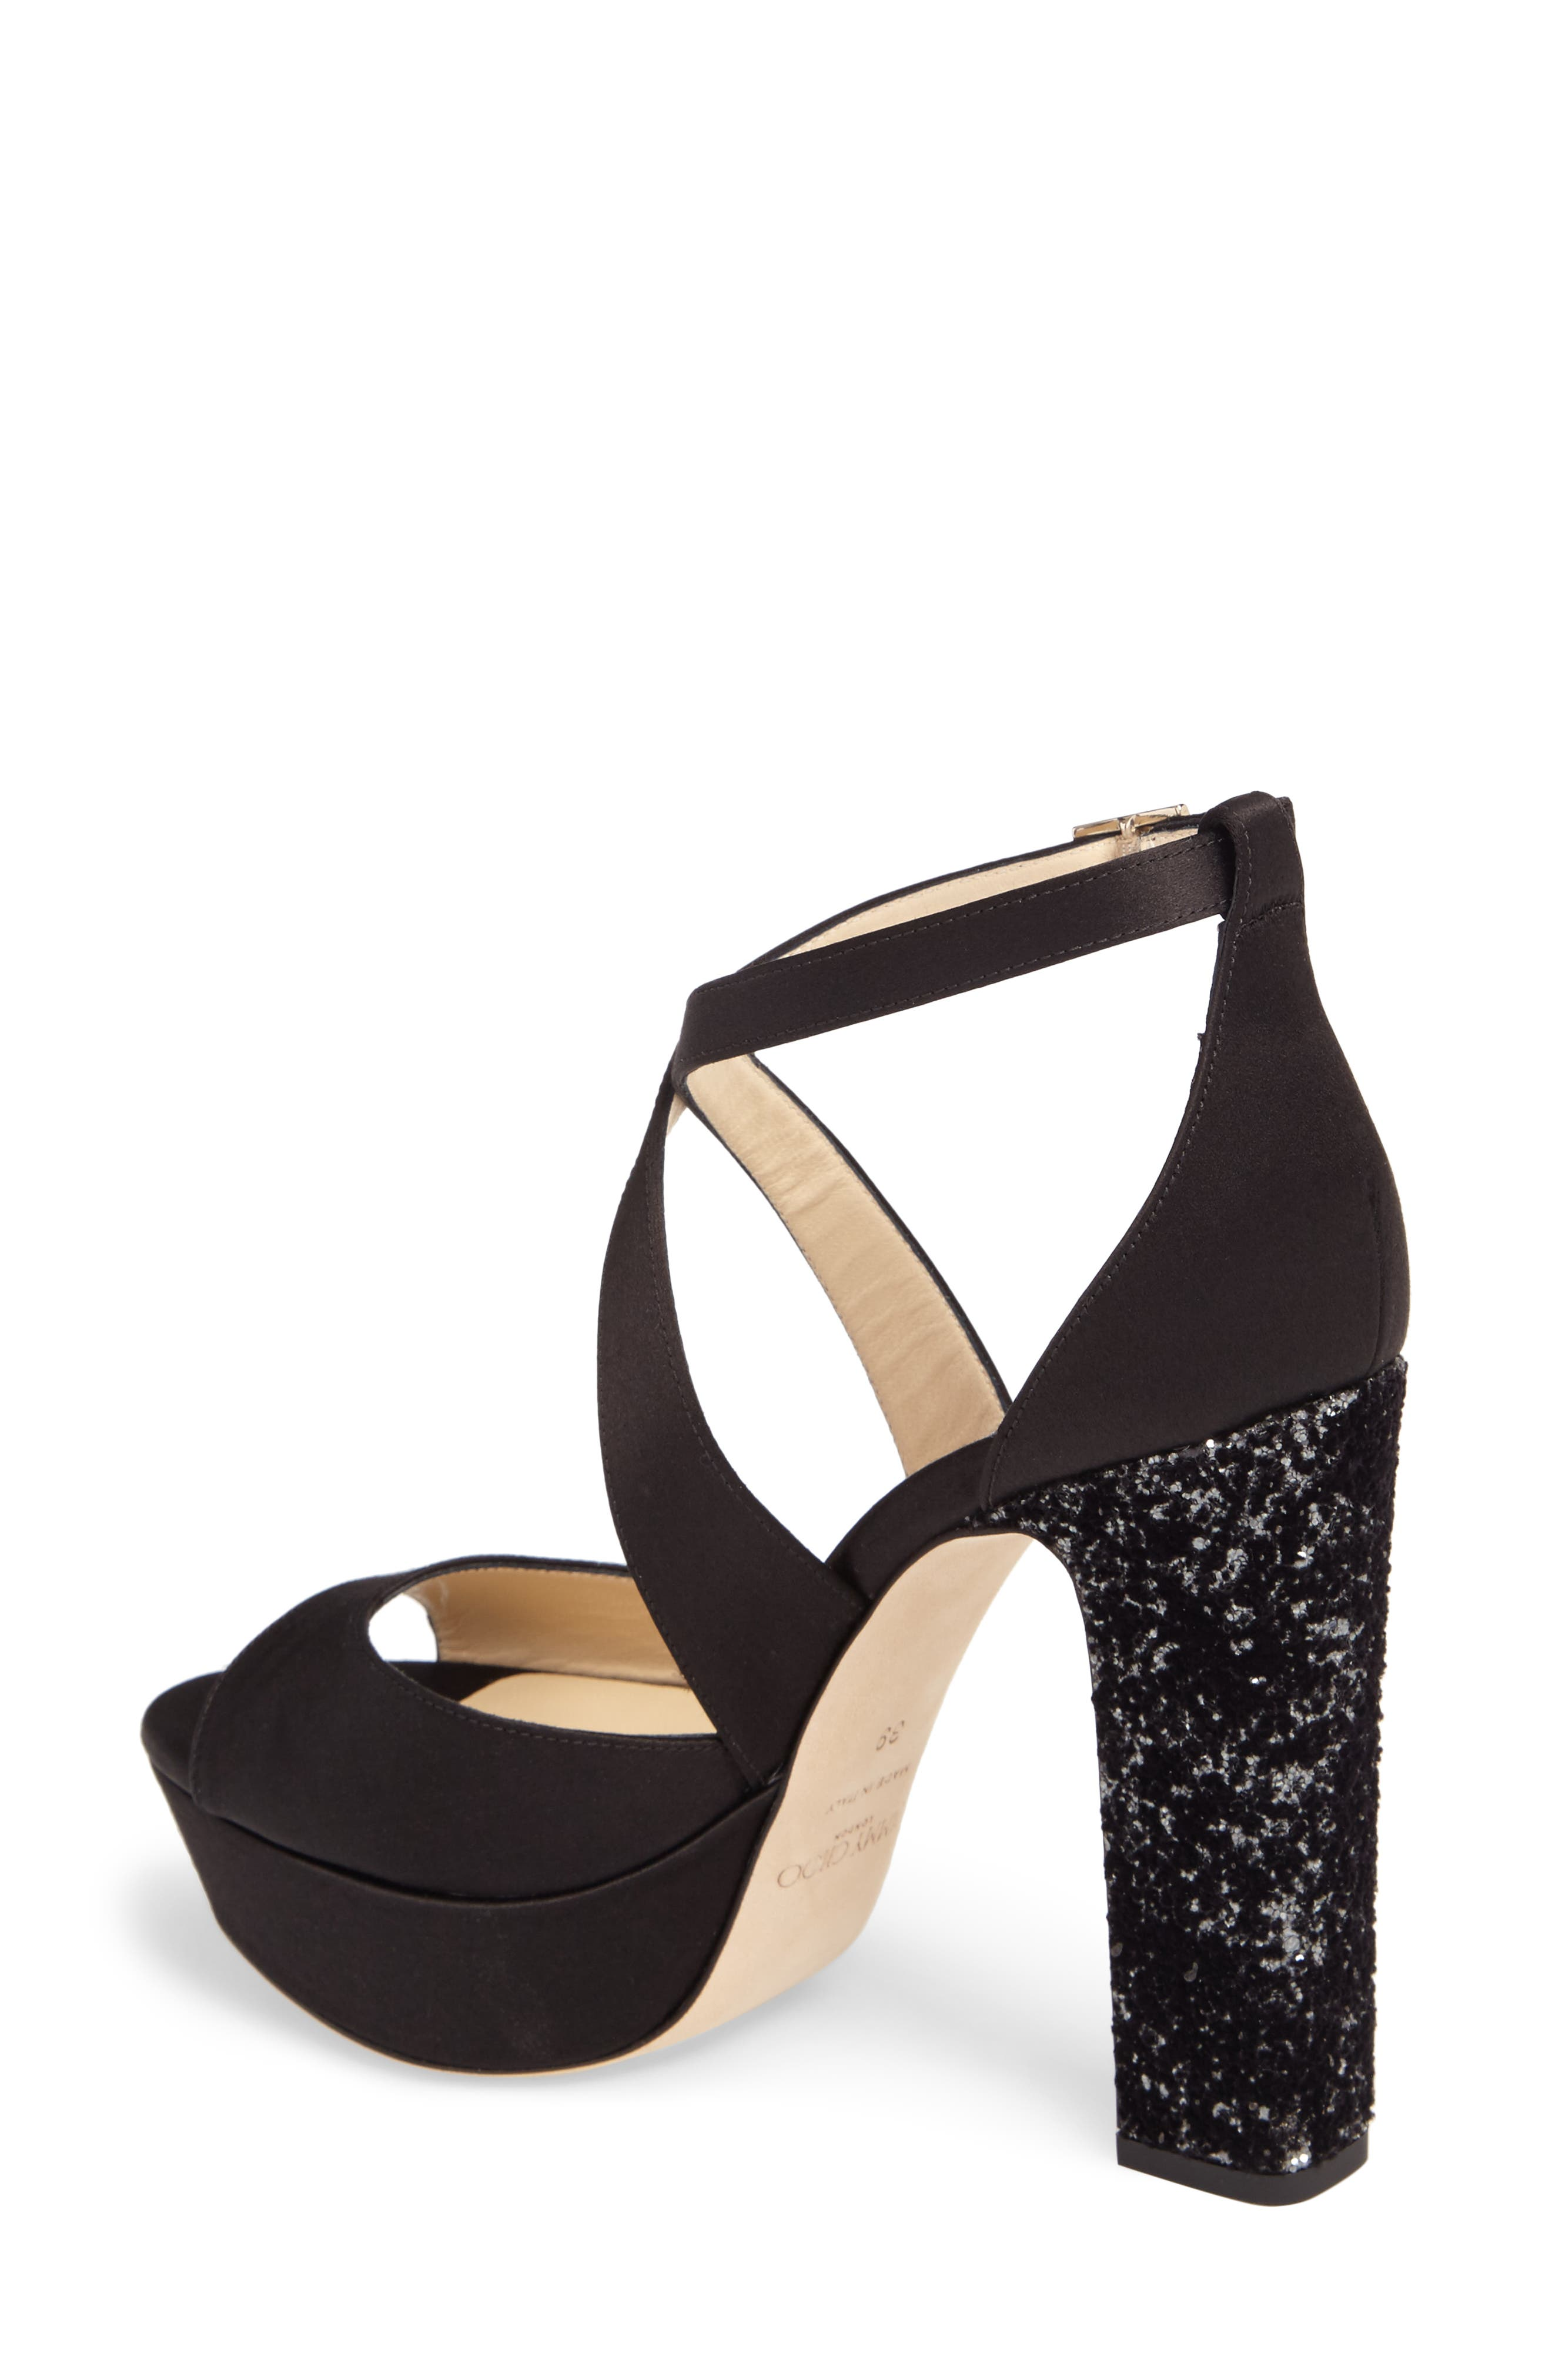 April Platform Sandal,                             Alternate thumbnail 2, color,                             Black/ Anthracite/ Black